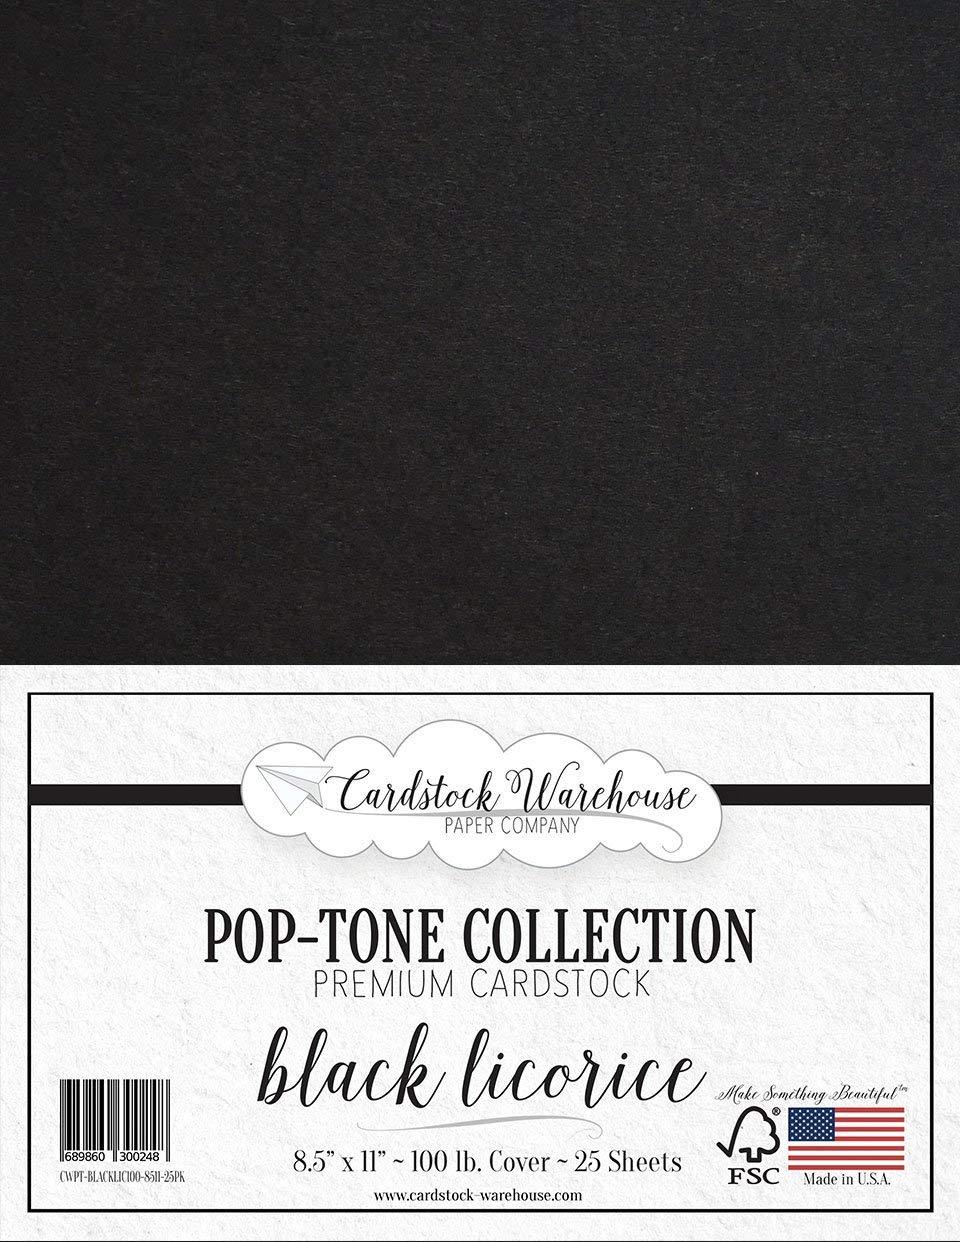 POPTONE 厚紙 8.5 x 11インチ 100ポンド 厚手カバー - Cardstock Warehouse 25枚 ブラック CWPT-BLACKLIC100-8511-25PK. B01LDM0Q48 Black Licorice